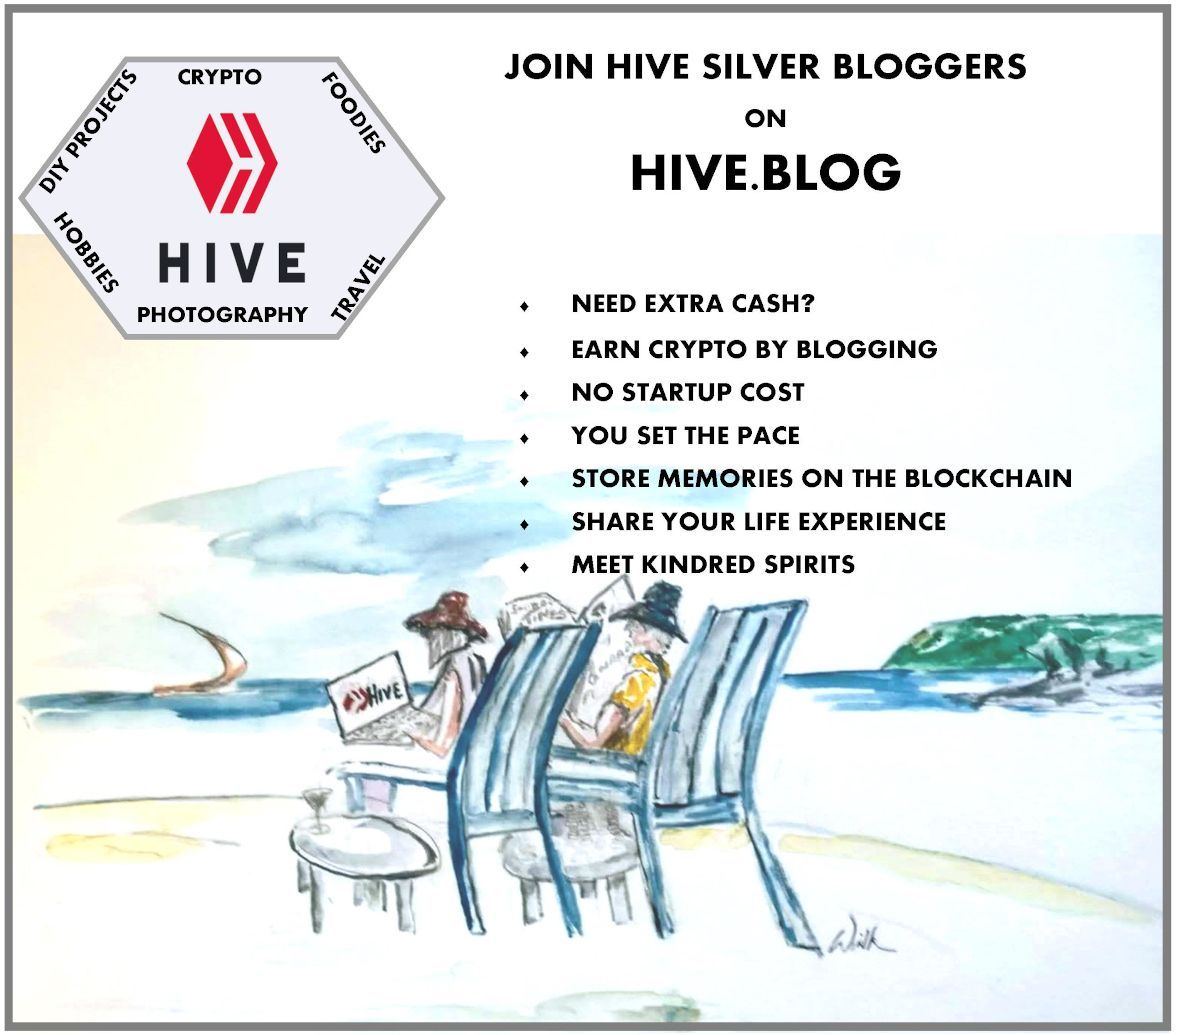 HiveSilverBloggers1.jpg